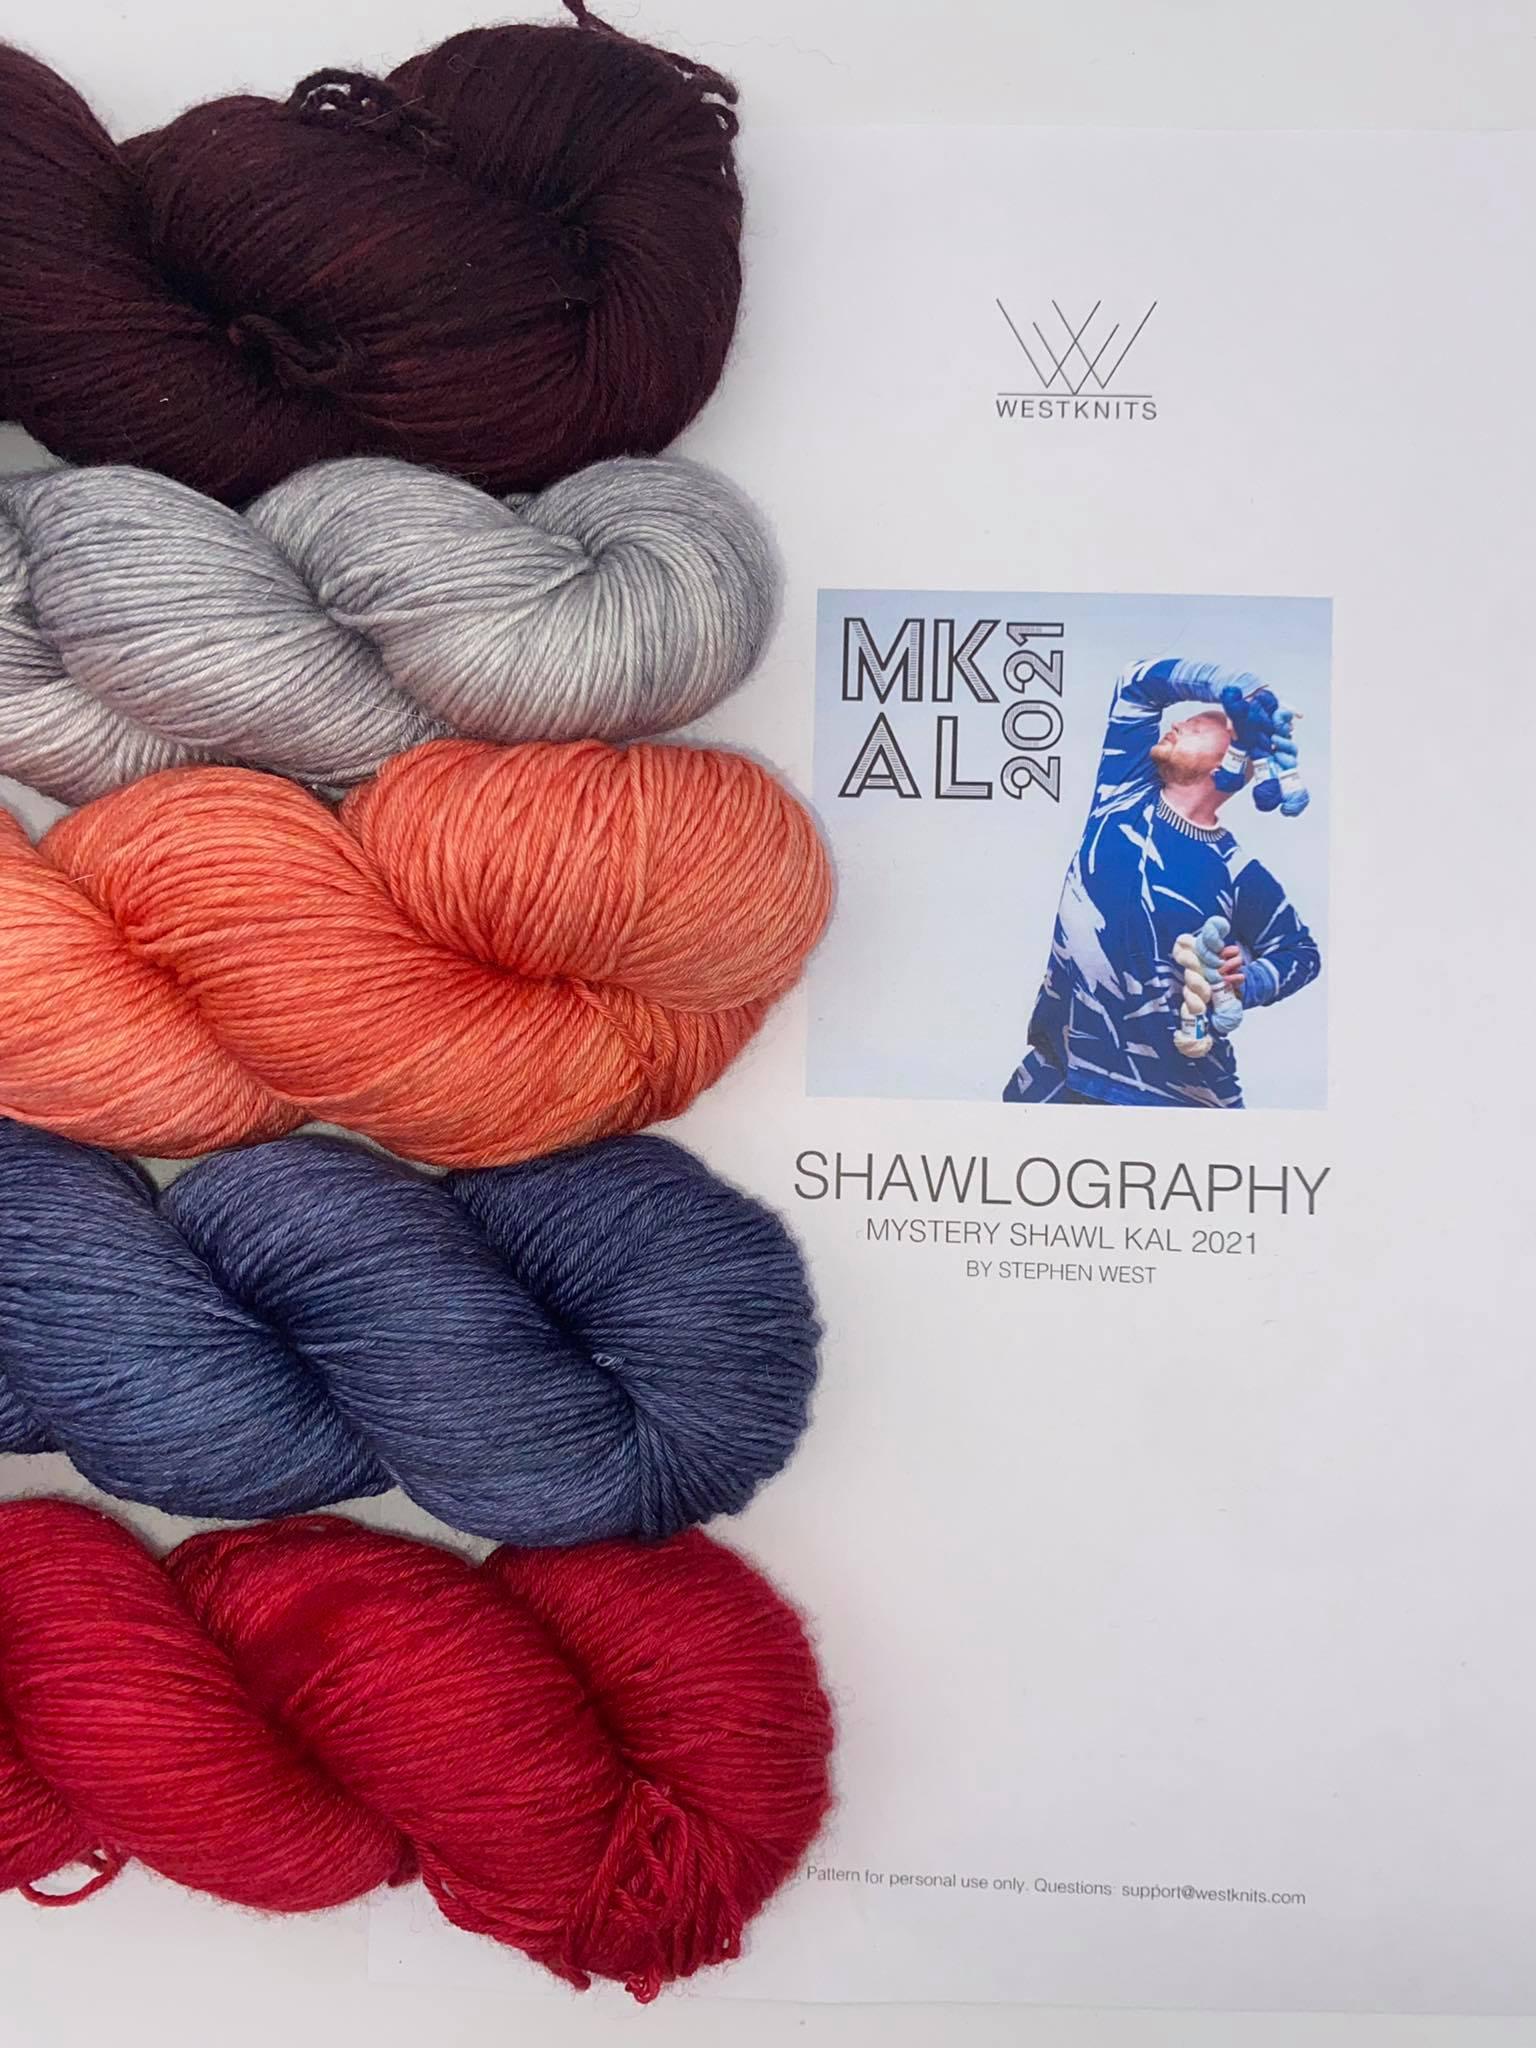 Woll Set Stephen West MKAL Shawlography #24